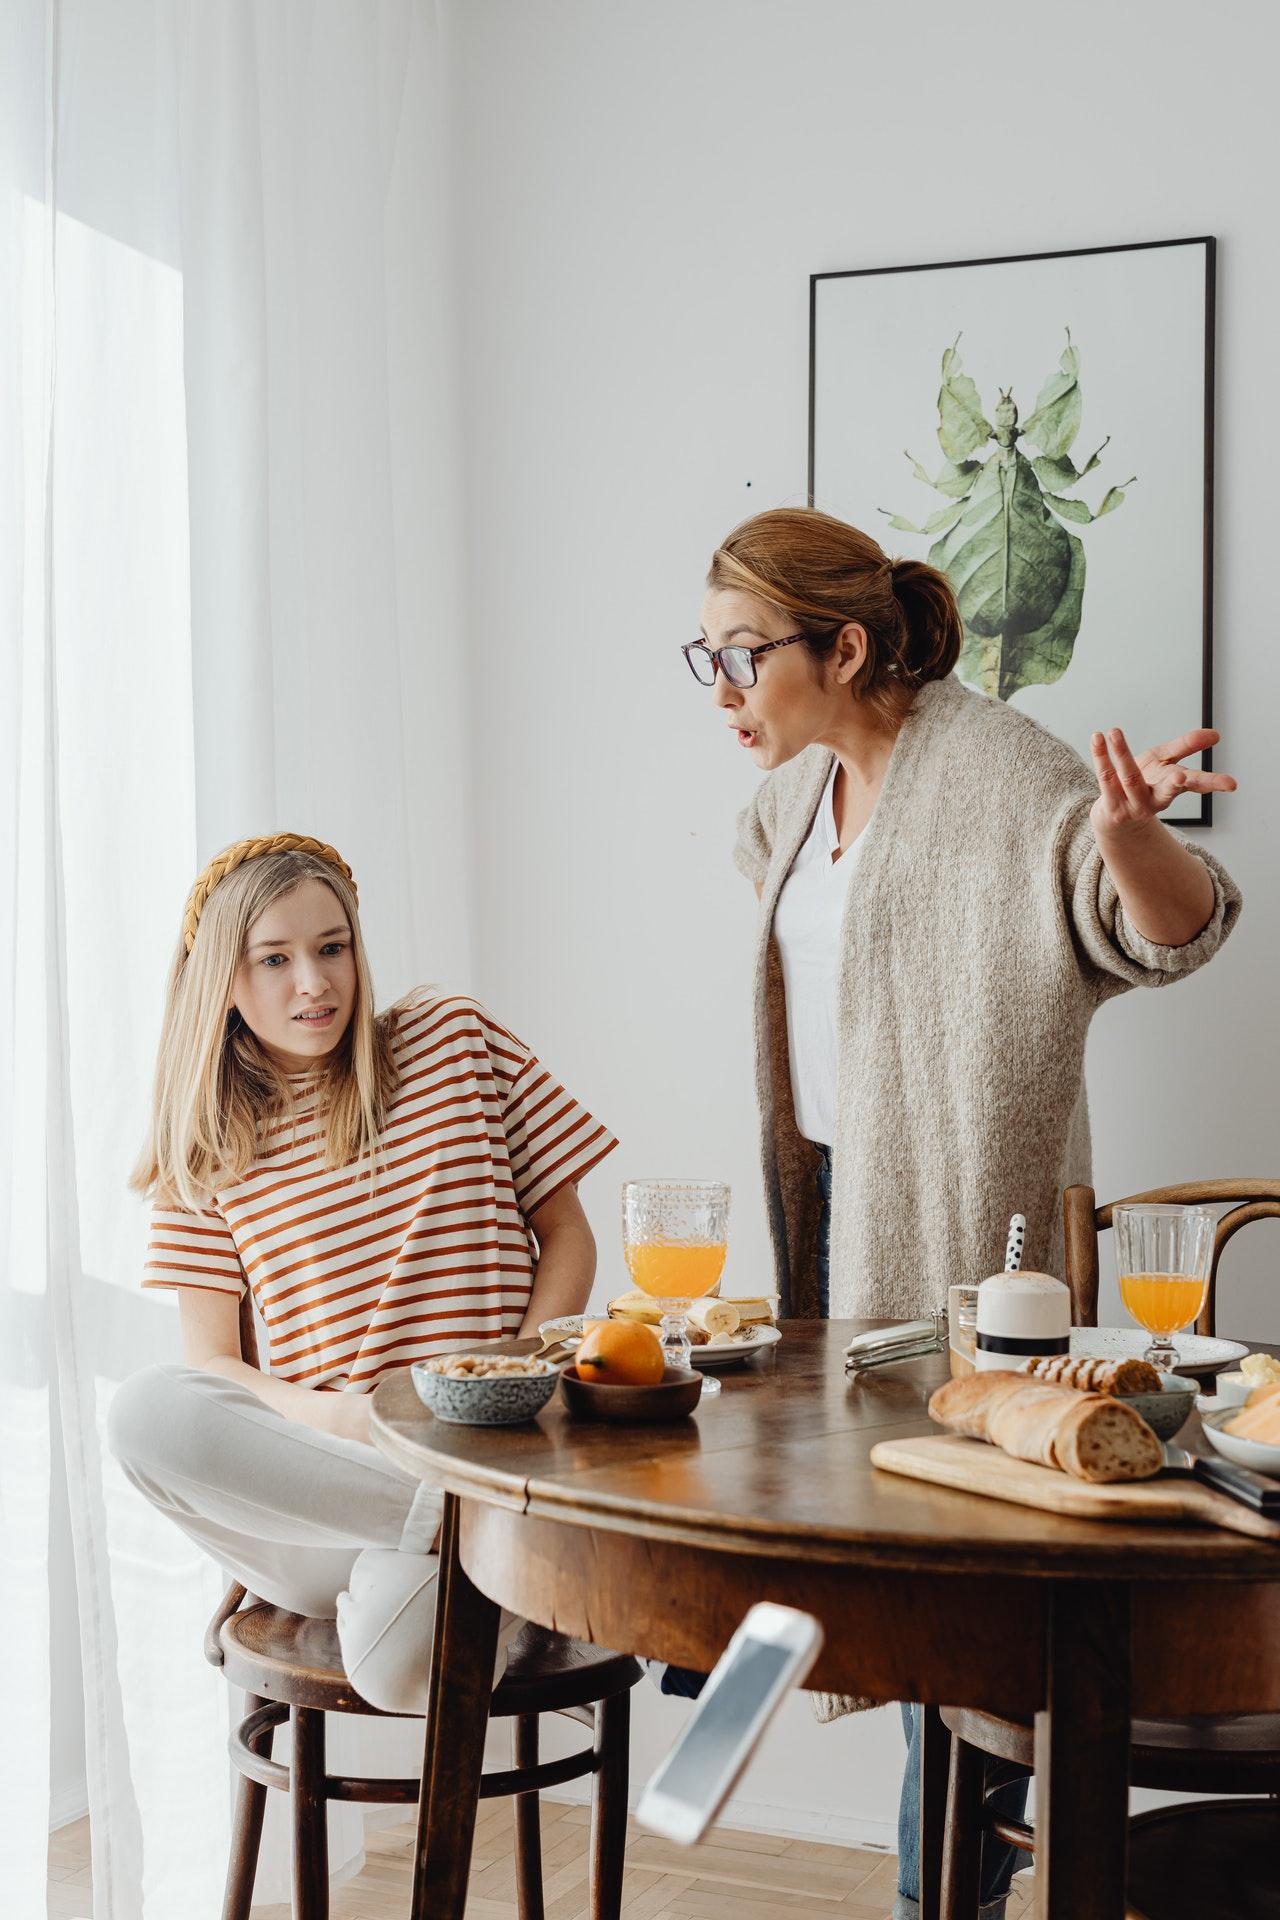 Seven Ways To Prevent Drug Addiction In Your Children